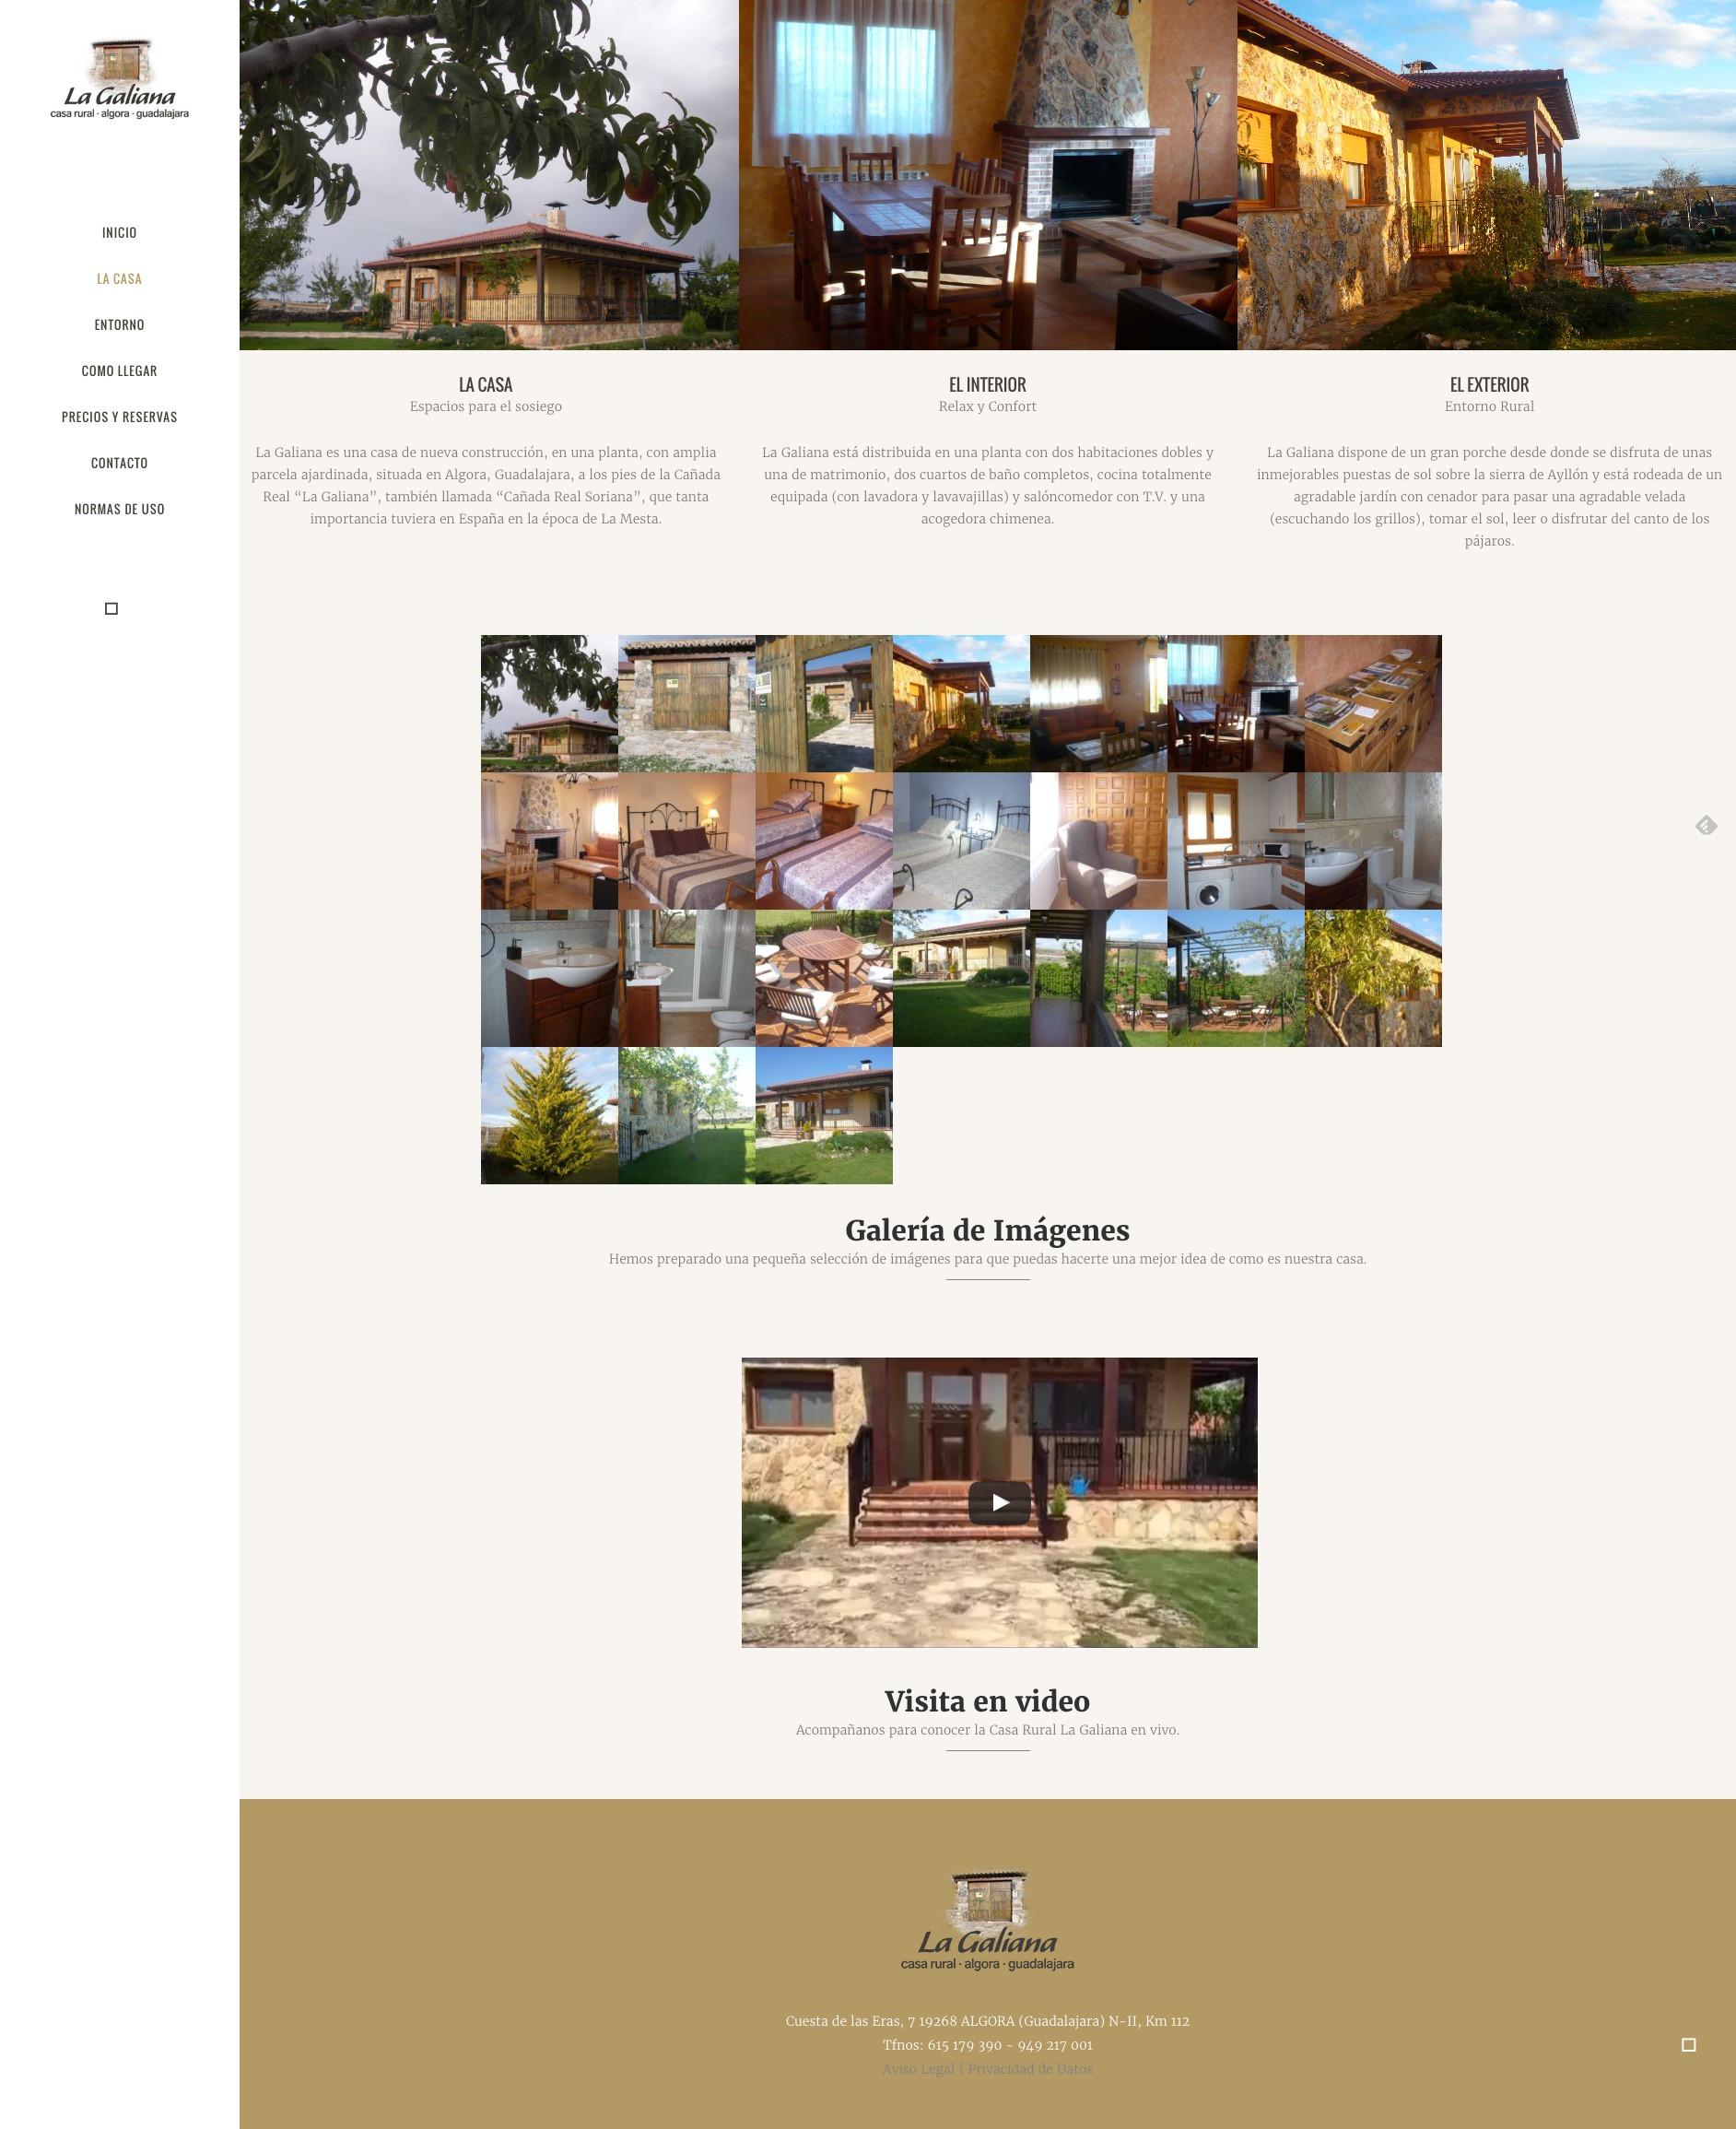 La Galiana casa rural detalle del alojamiento